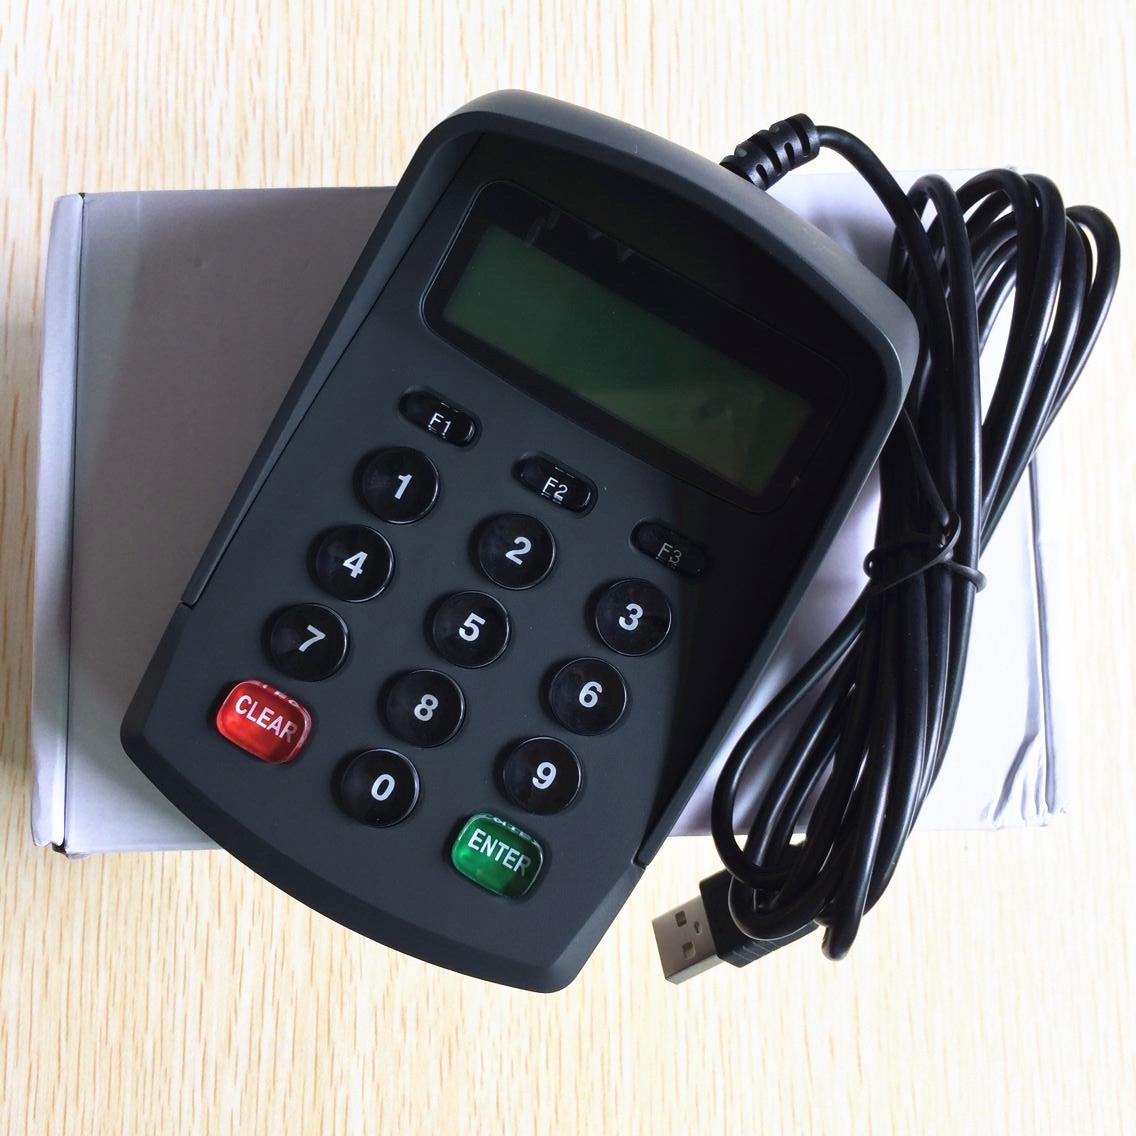 Plug Play Usb Pos Pinpad Digital Password Keyboard Numeric Keypad With Lcd